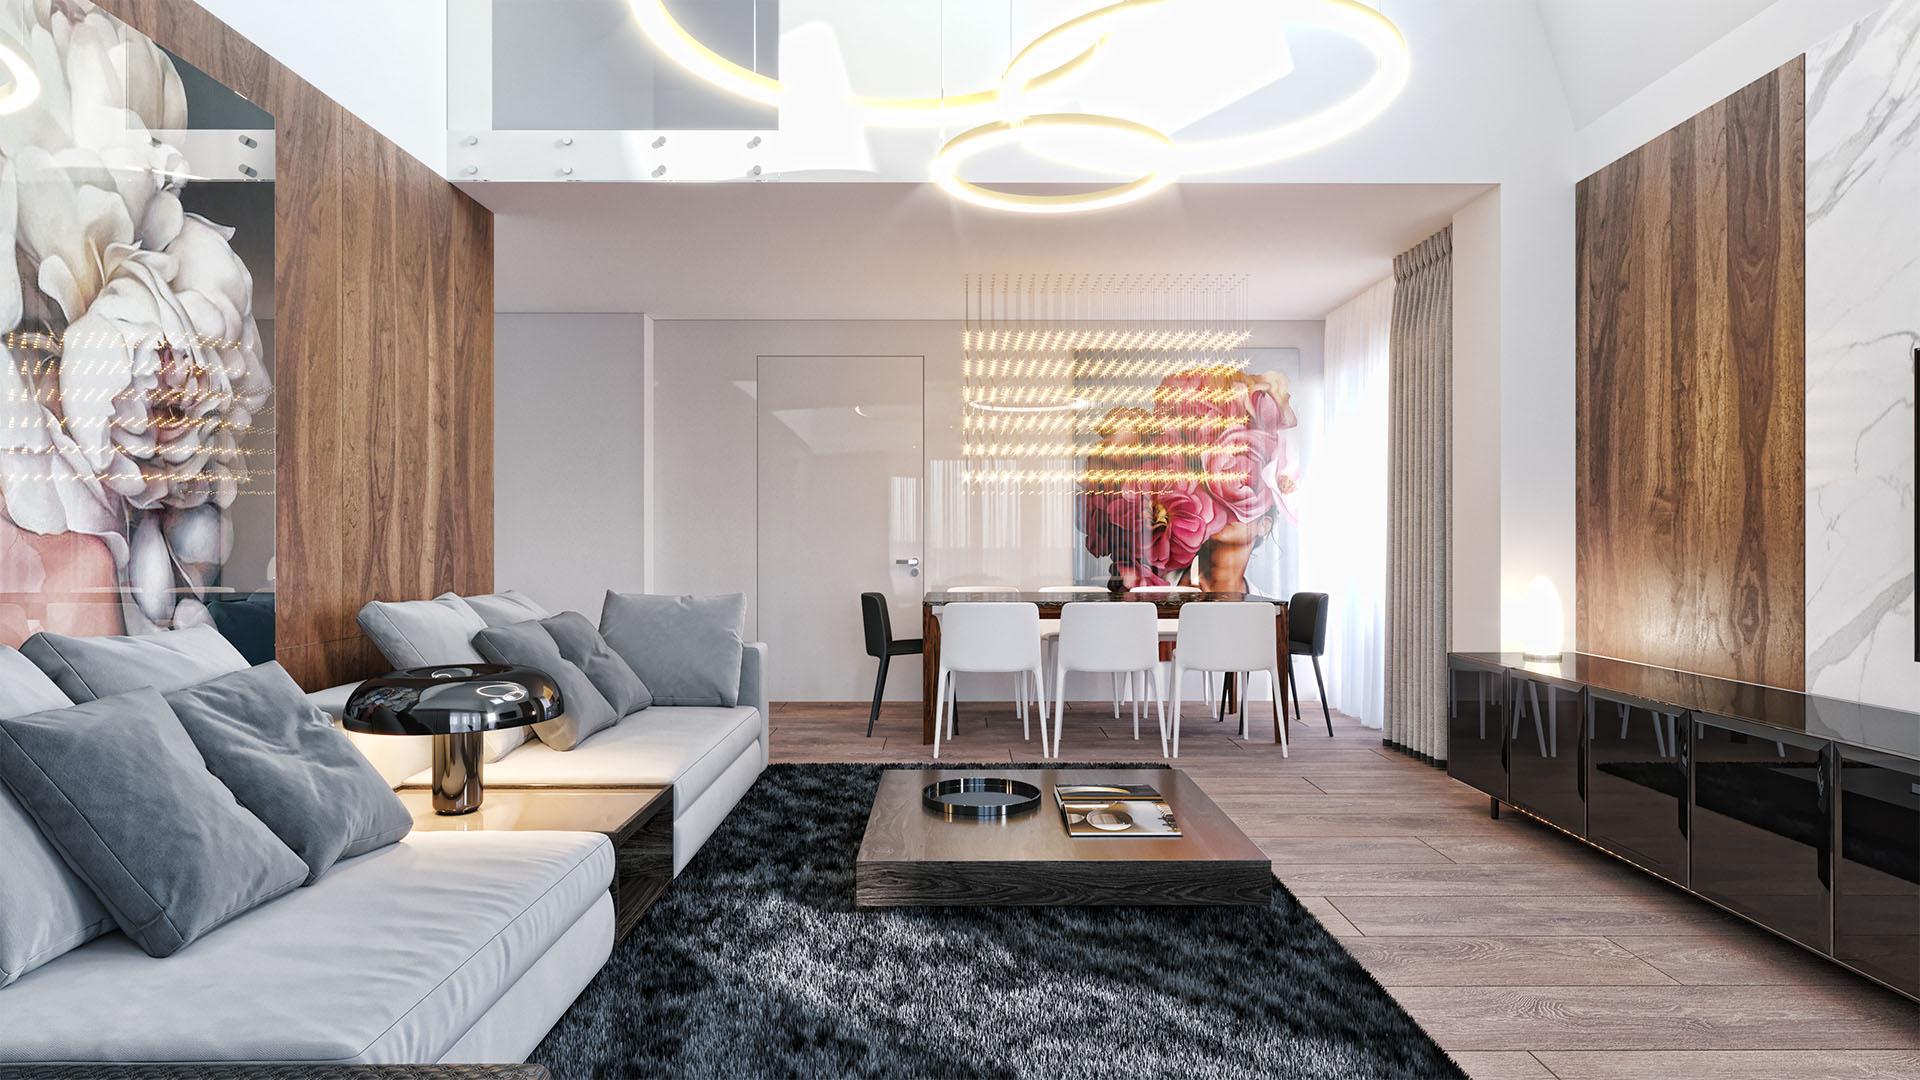 Sunset Lake Homes - propunere amenajare apartament 2